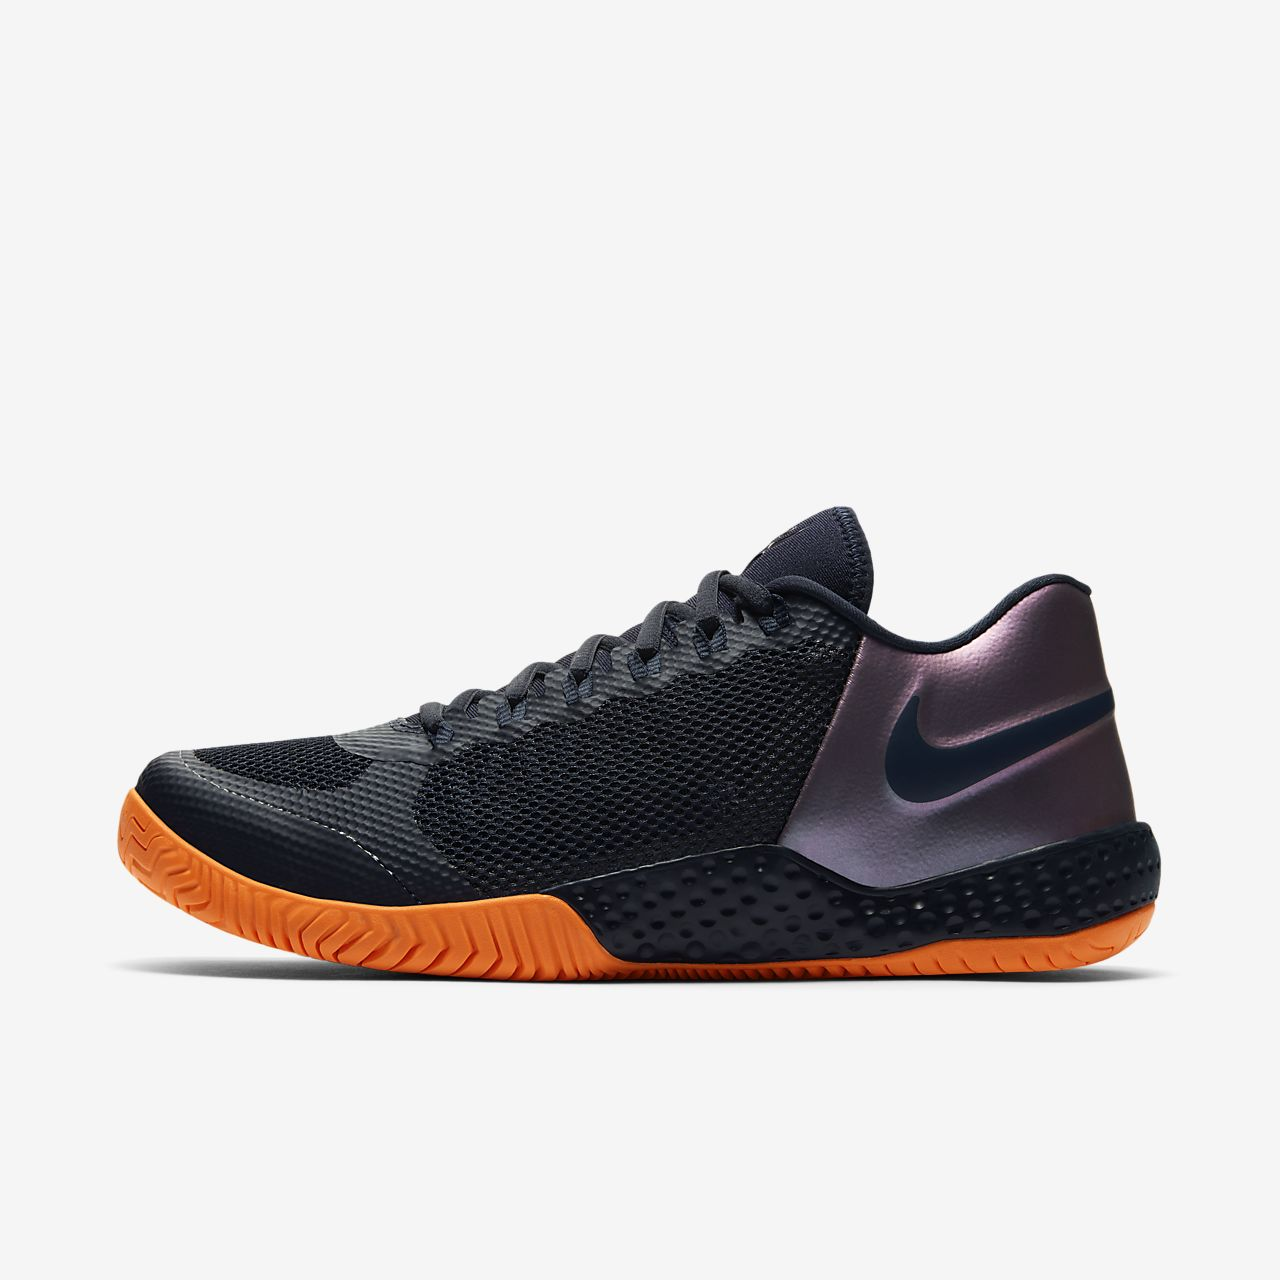 NikeCourt Flare 2 Damen-Tennisschuh für Hartplätze